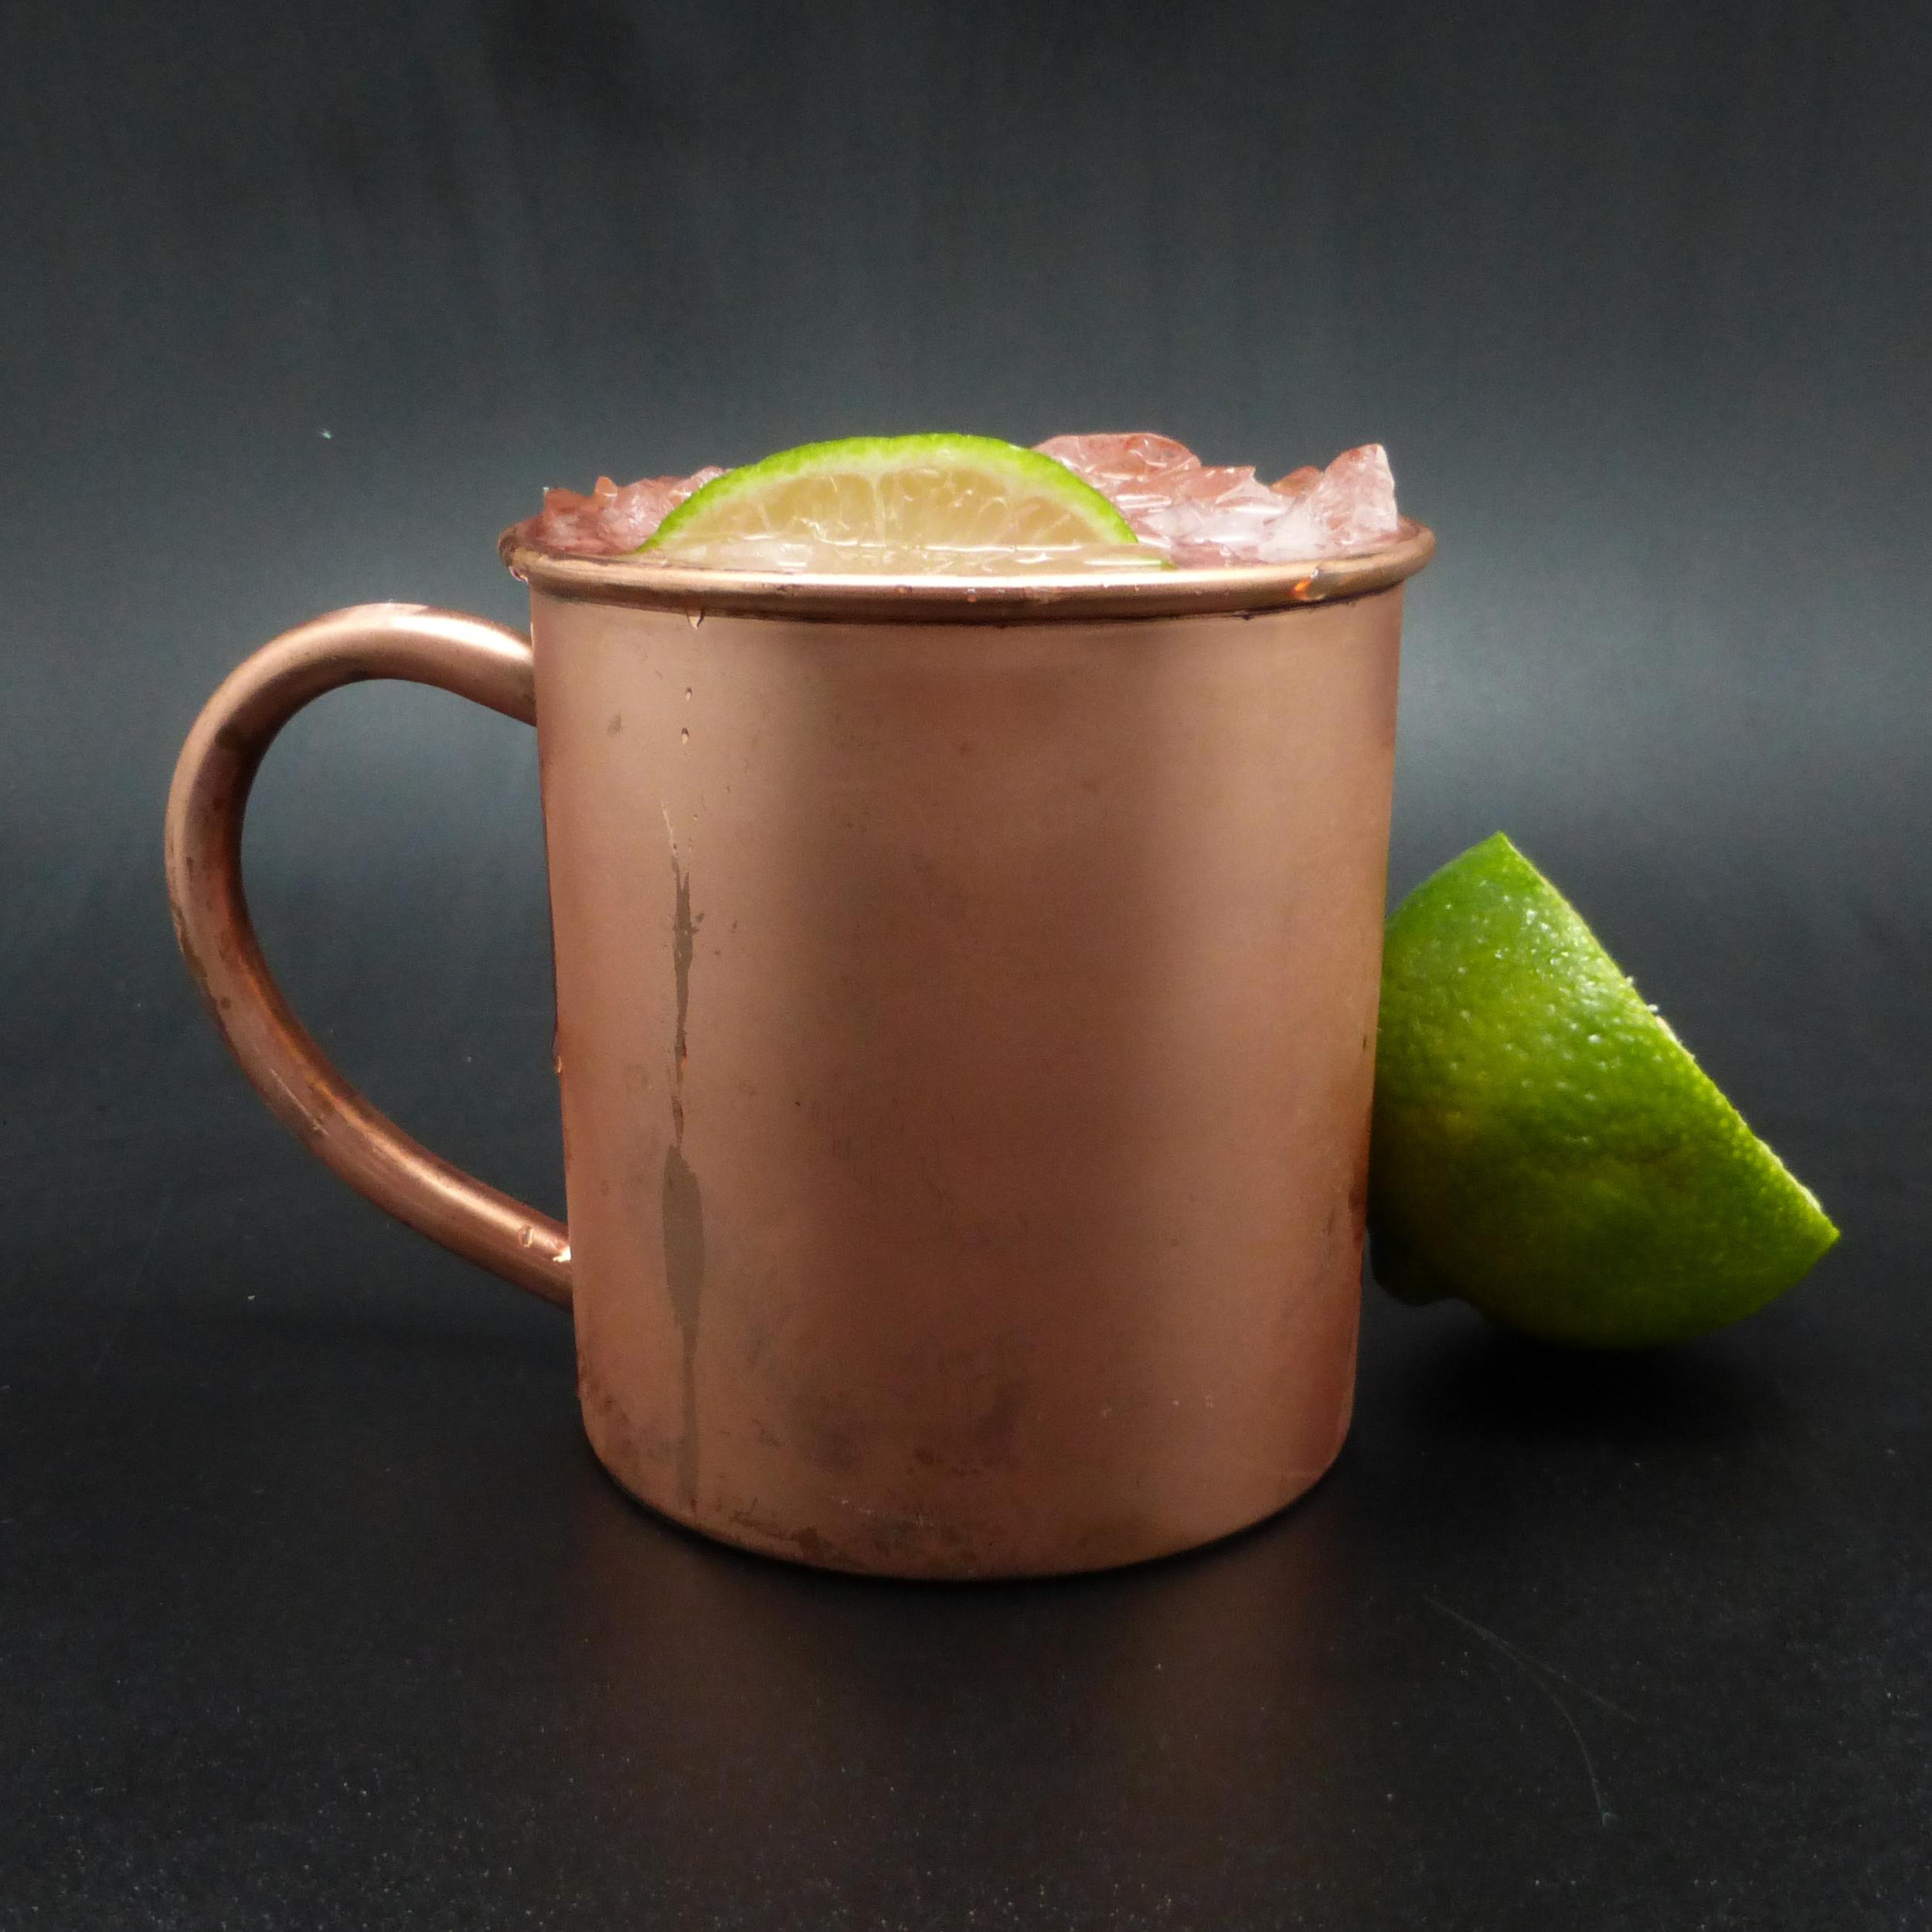 Pickers Vodka Mule